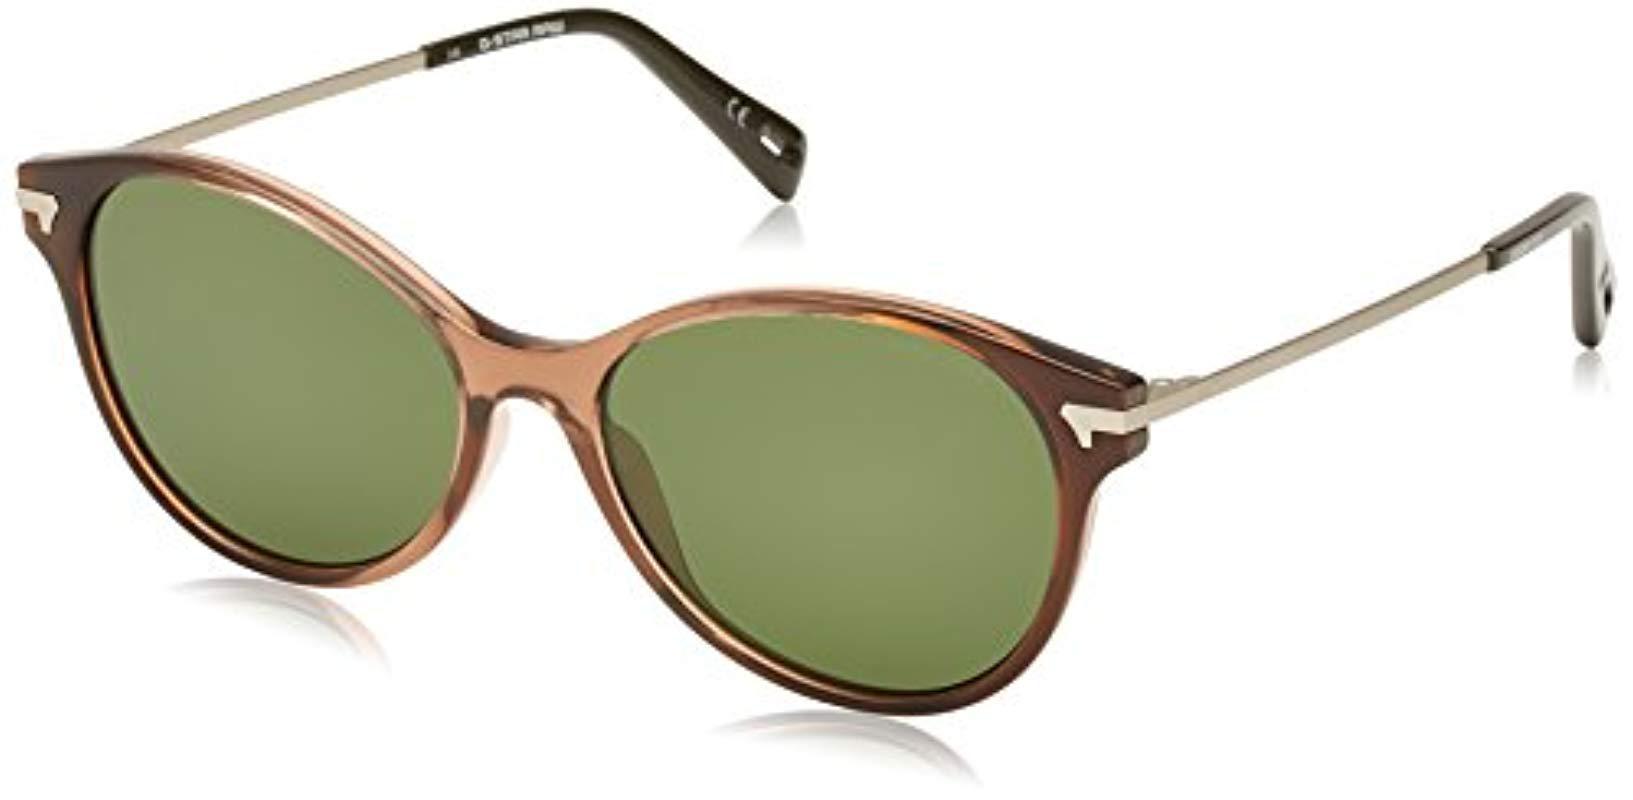 fd7dfb7188c7 G-Star RAW G-star Gs628s Combo Oxlex Cat Eye Sunglasses in Brown - Lyst